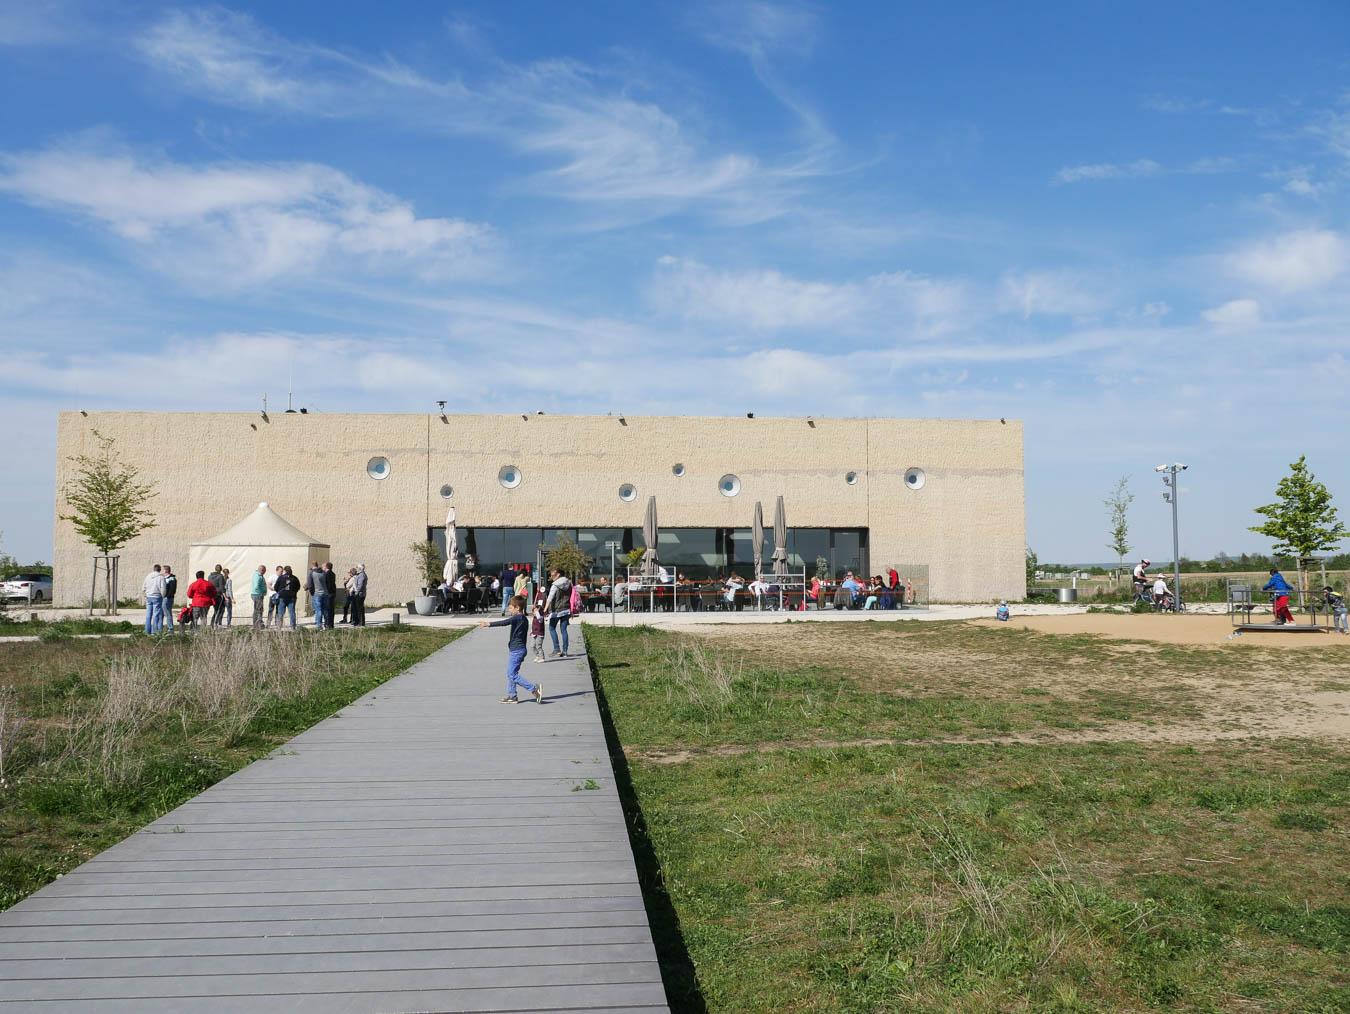 Eventforum Terranova